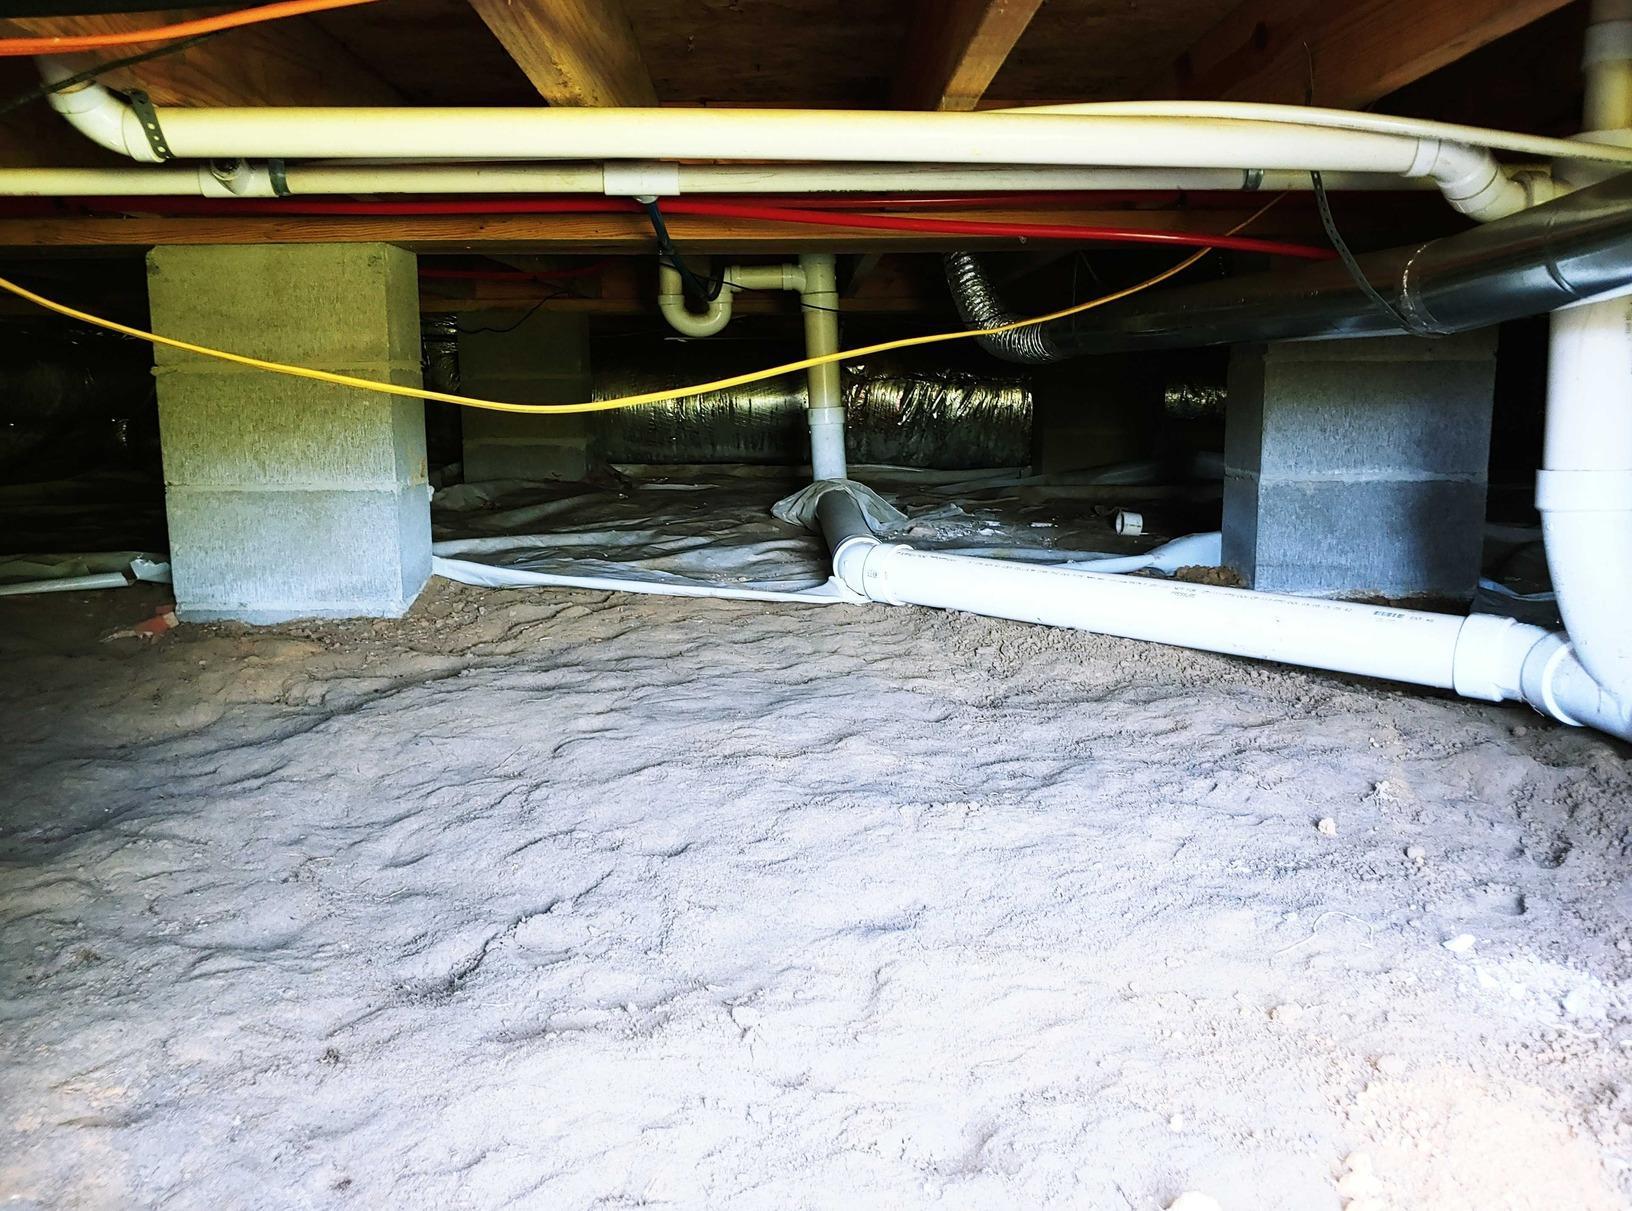 Crawl Space Encapsulation in Rebecca, FL - Before Photo